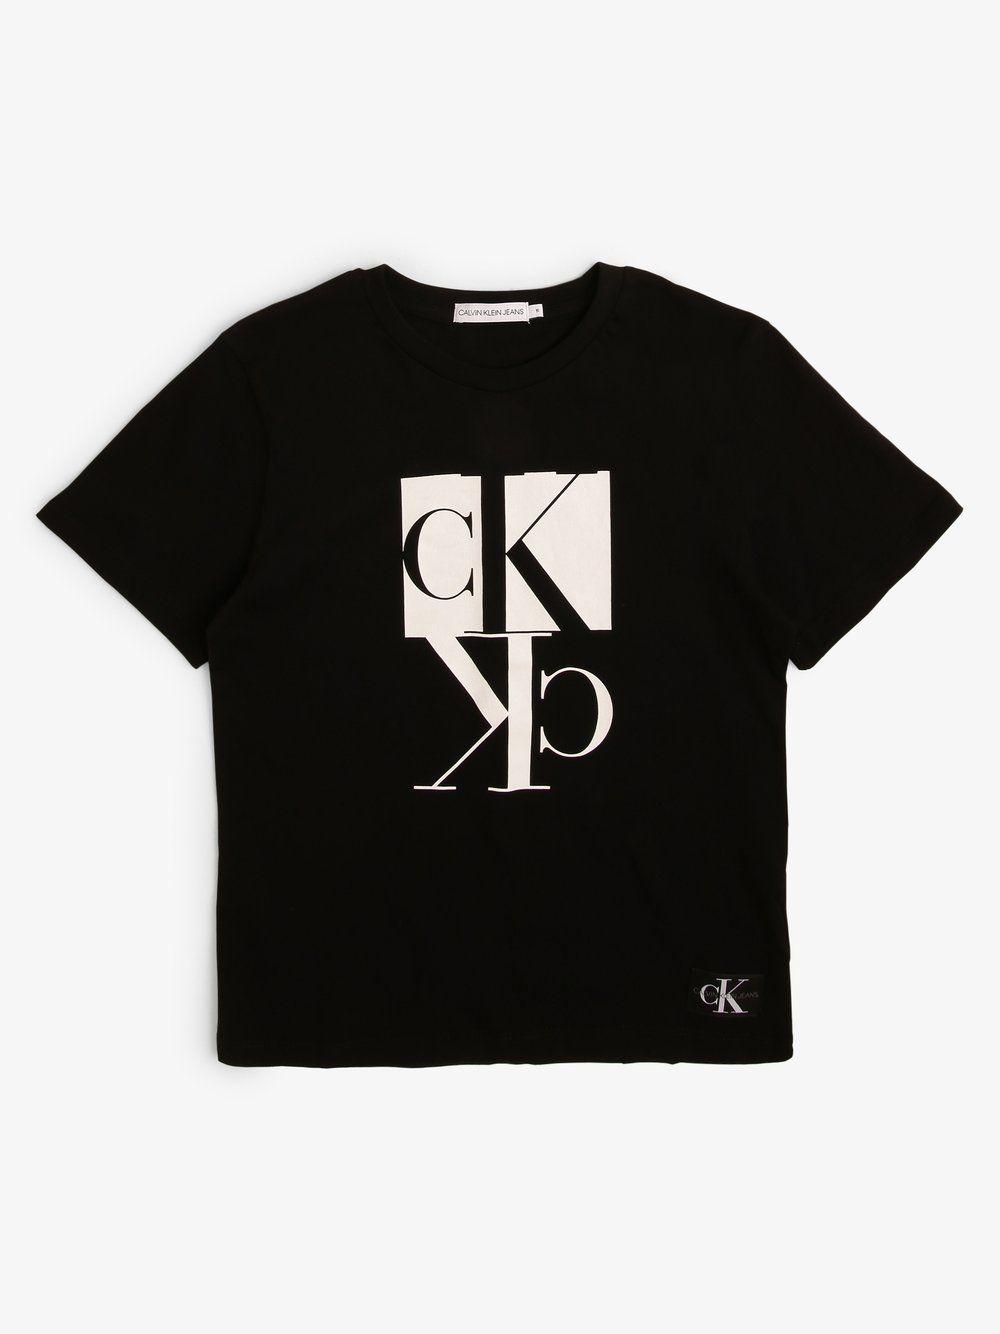 Calvin Klein Jeans Jungen T Shirt Online Kaufen In 2020 Shirts Jeans T Shirt